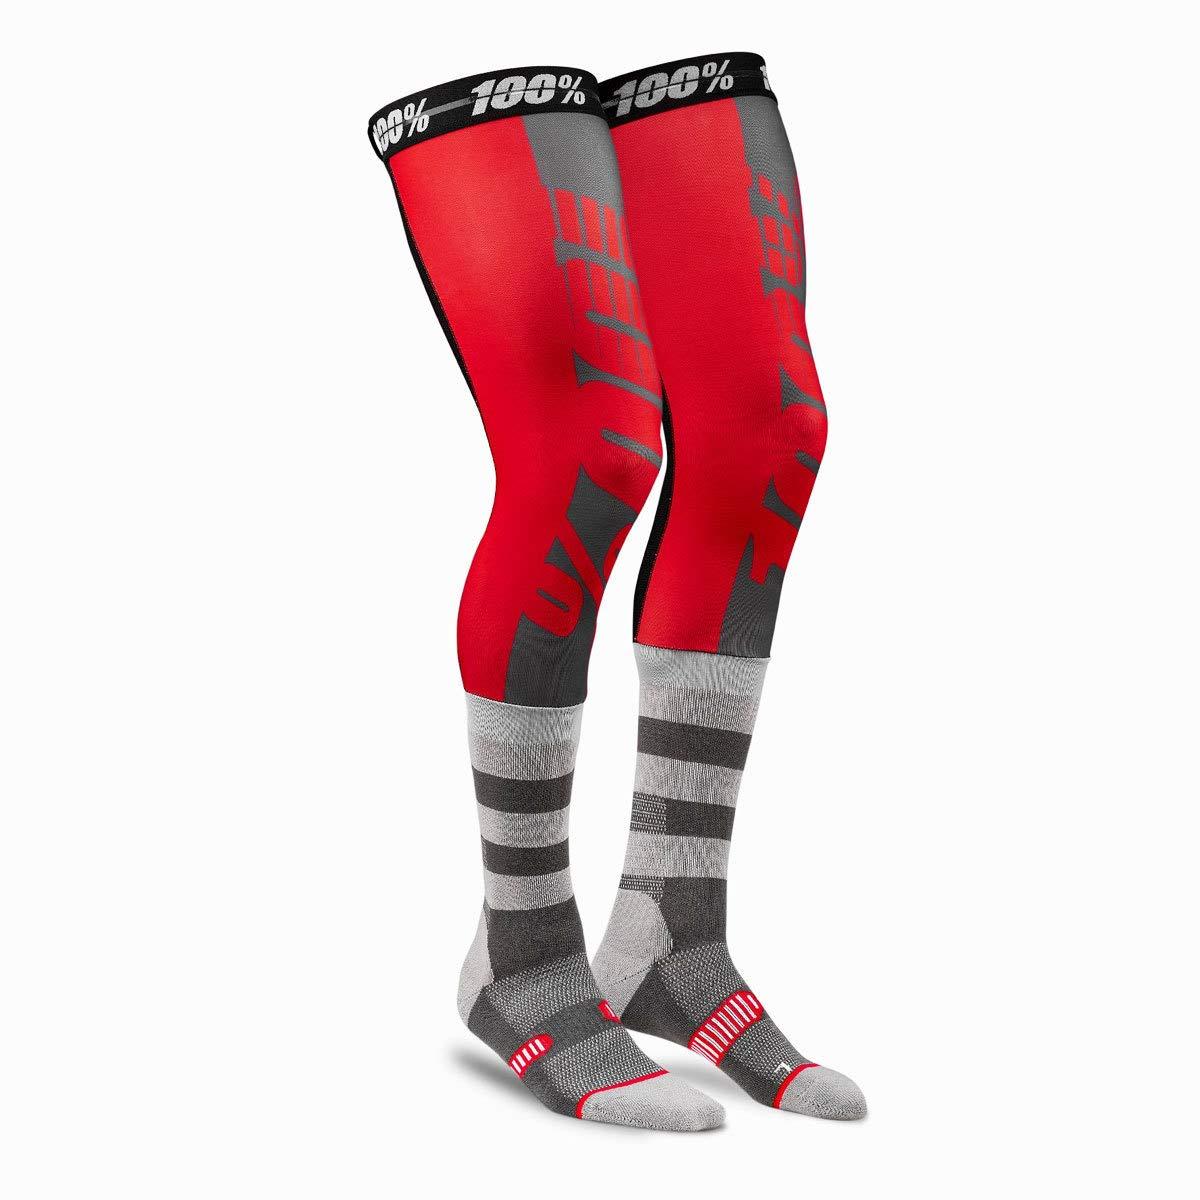 100% Rev Knee Brace Performance Moto Socks - Red MX Riding Sleeves Sock Adult Small/Medium